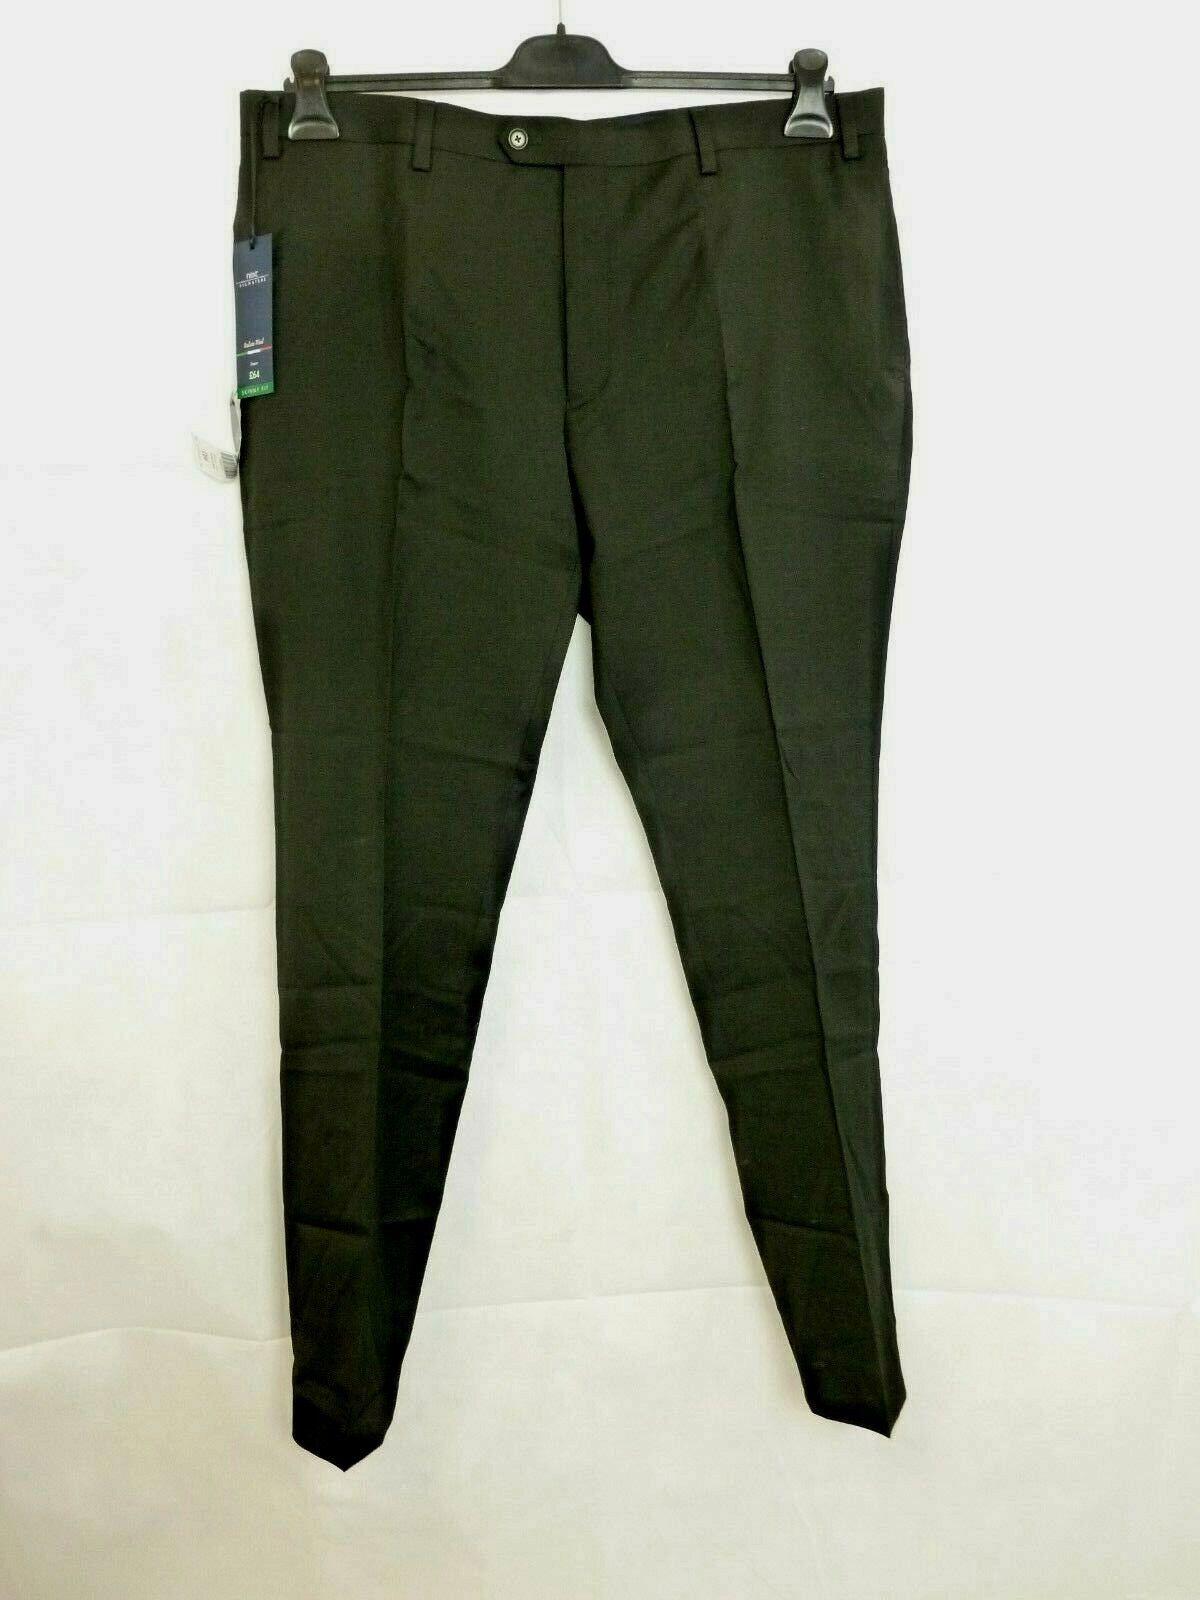 Next Skinny Fit Italian Wool Trousers 38R TD086 PP 09